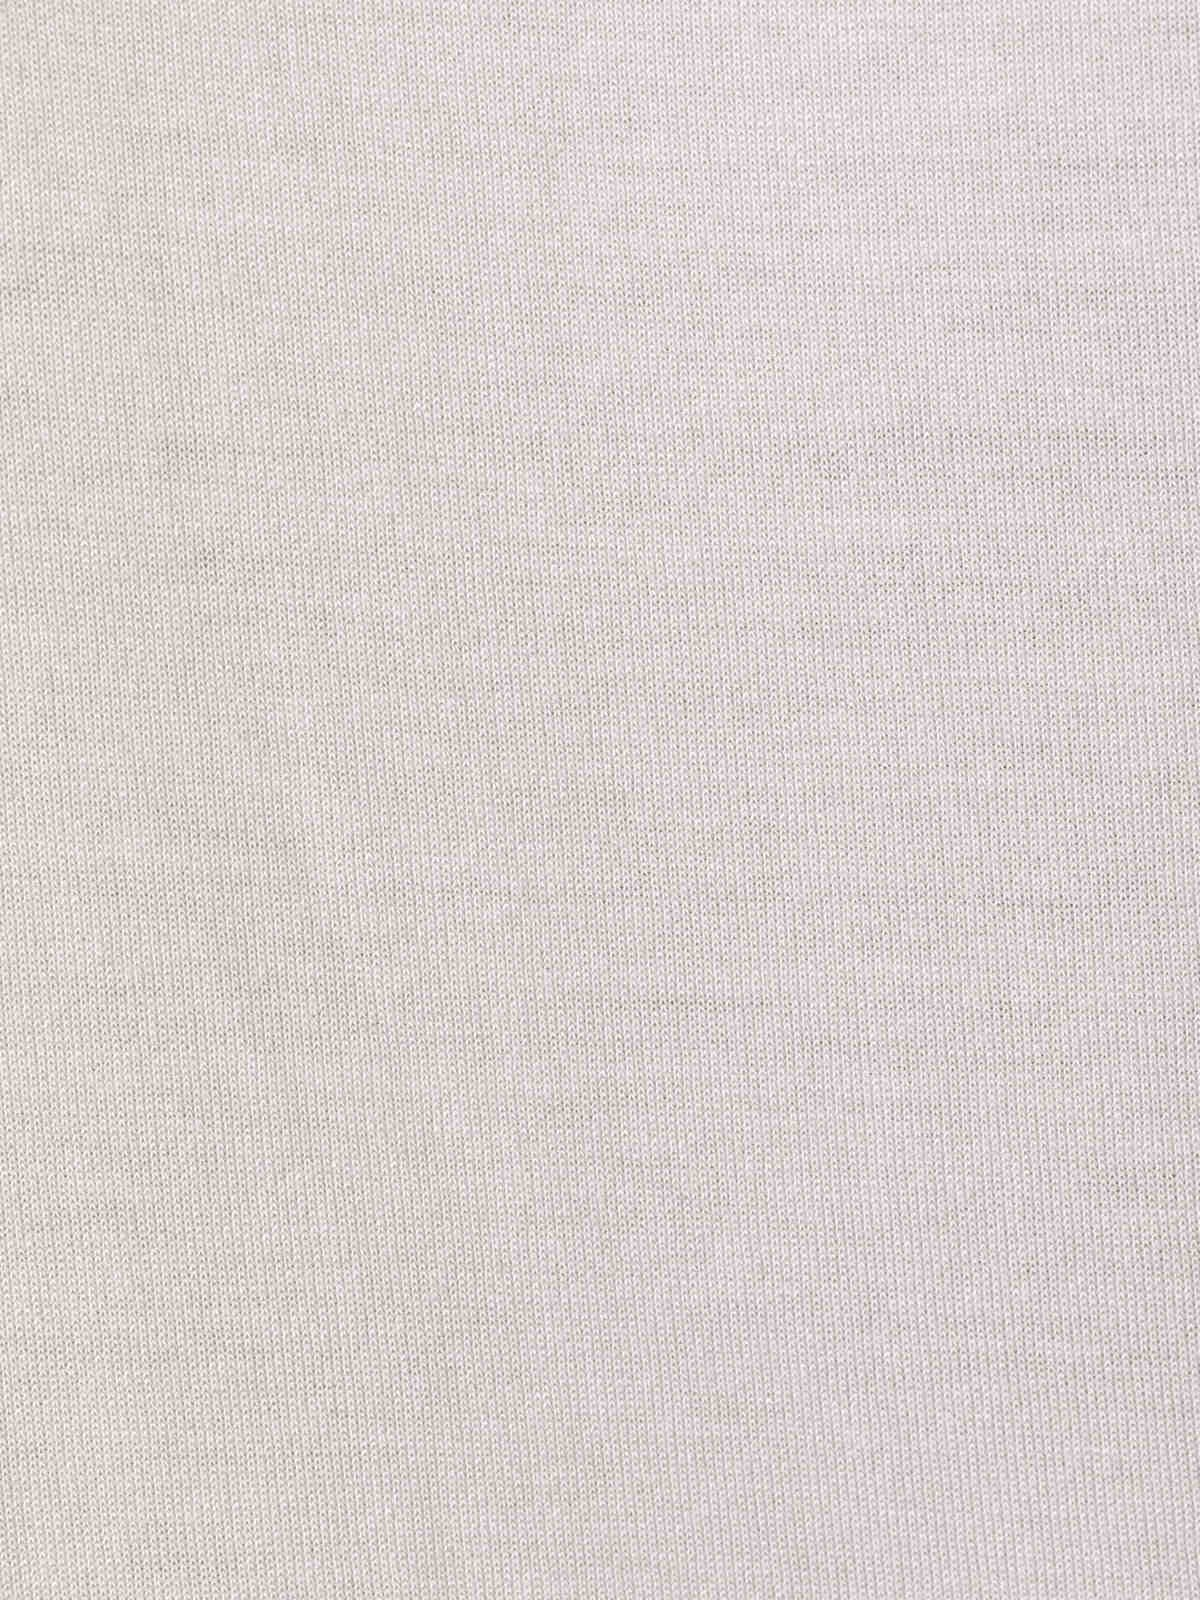 Camiseta mujer tirante ancho Beige